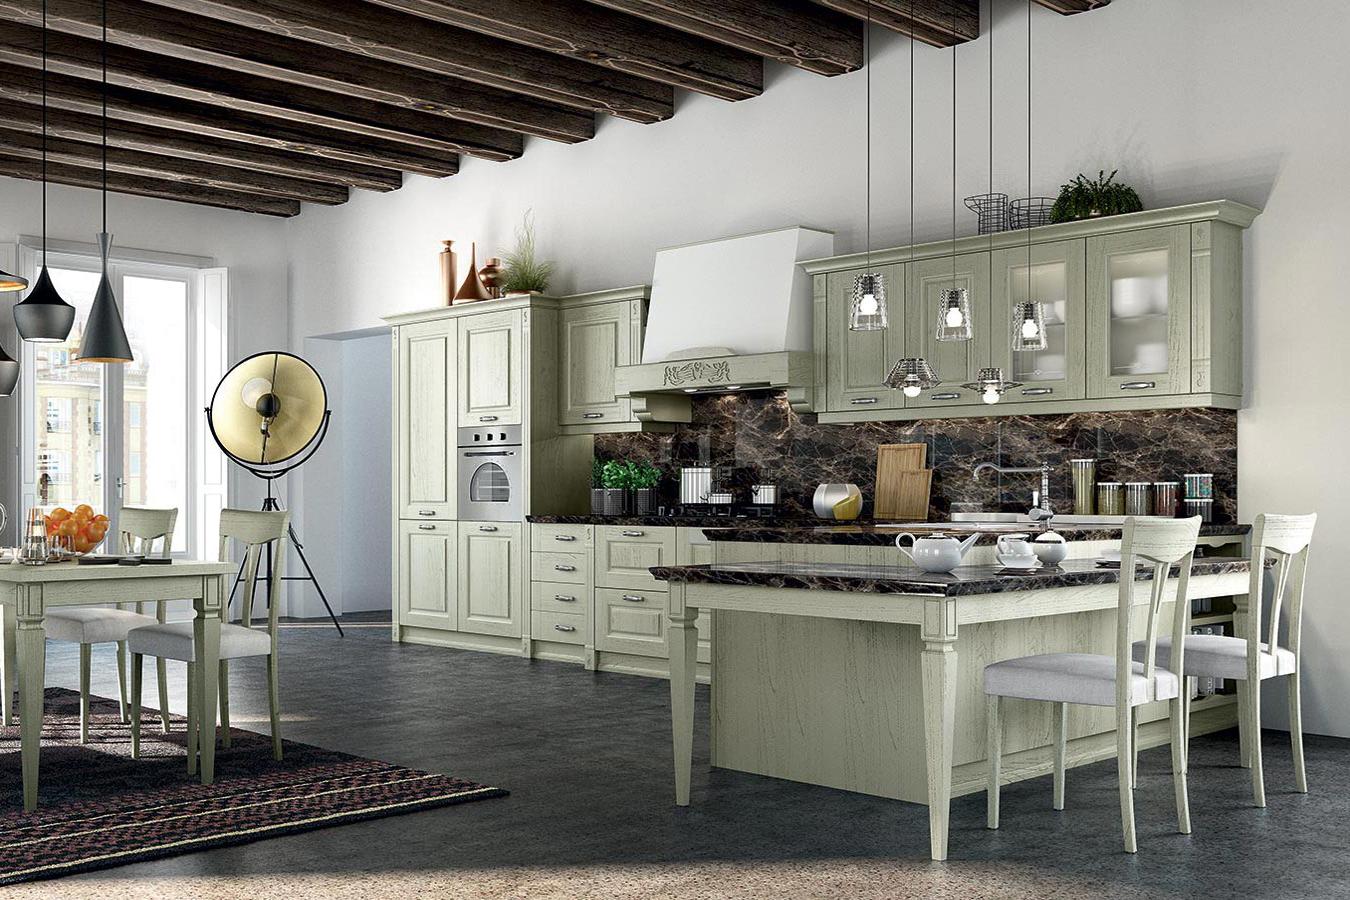 Cucina classica verona di arredo3 righetti mobili novara for Cucina verona arredo 3